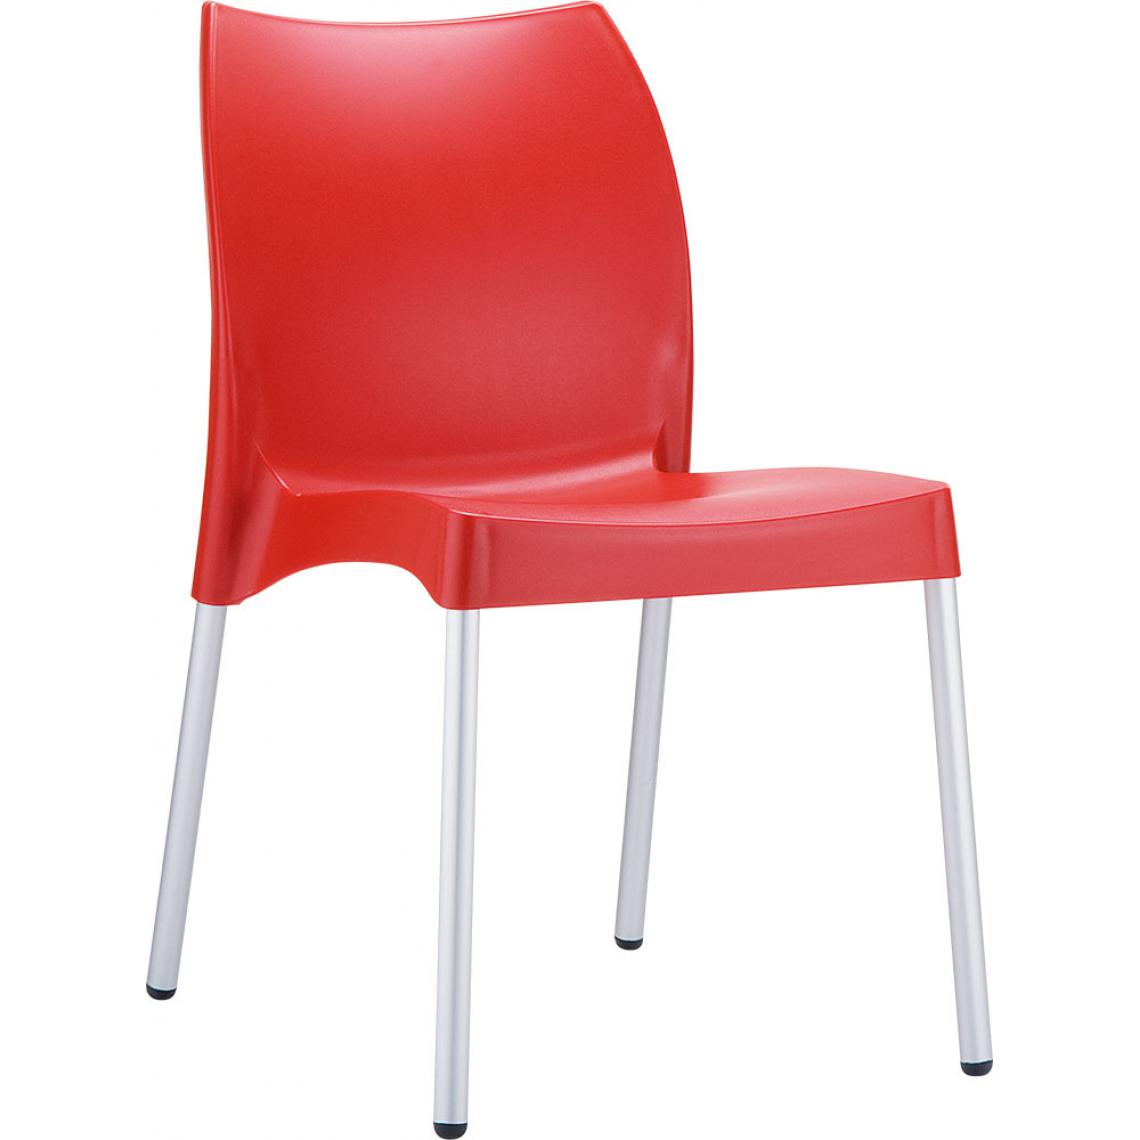 chaise design rouge martha 3suisses. Black Bedroom Furniture Sets. Home Design Ideas